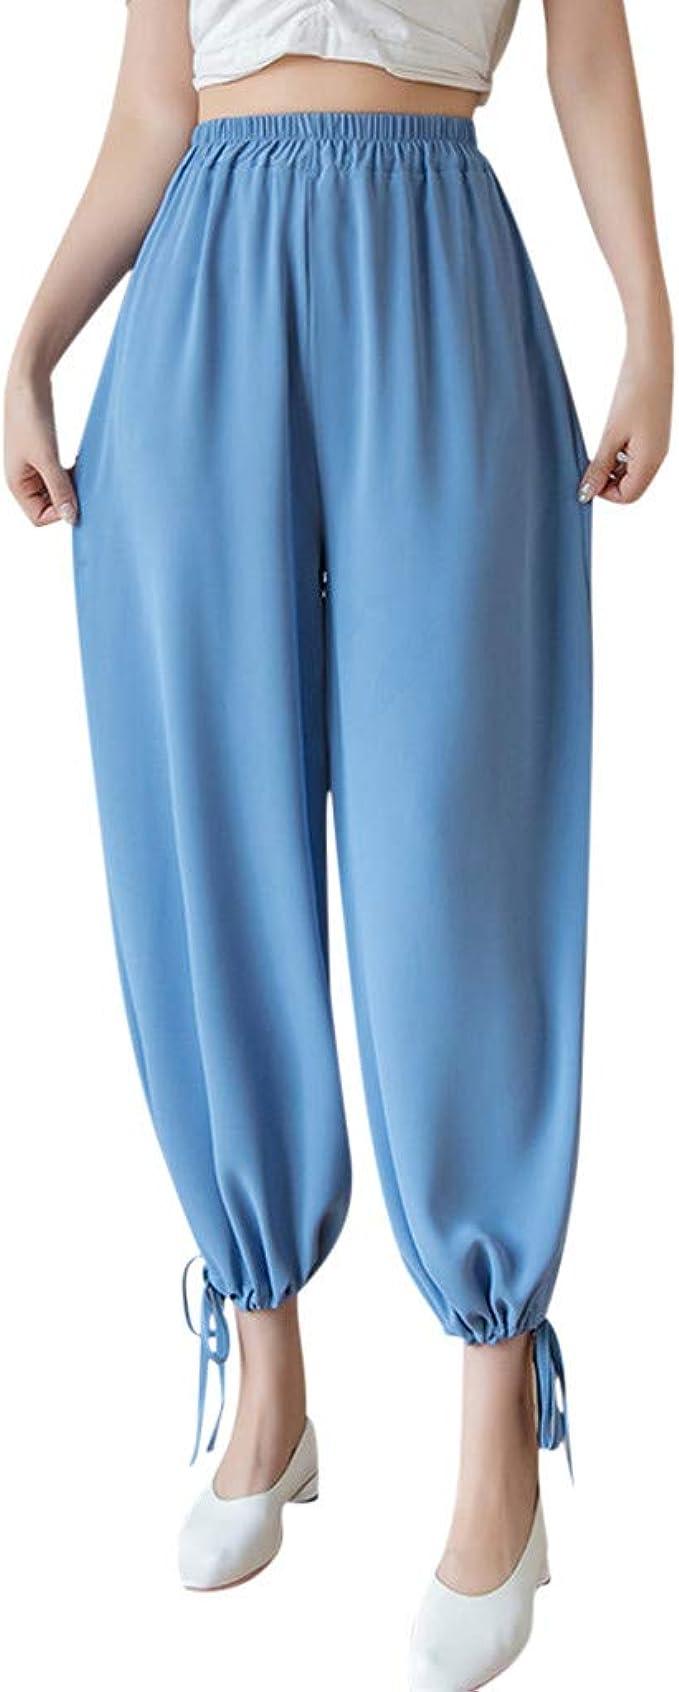 BOBOLover Pantalones de Gasa para Mujer Cintura Alta Falda de ...